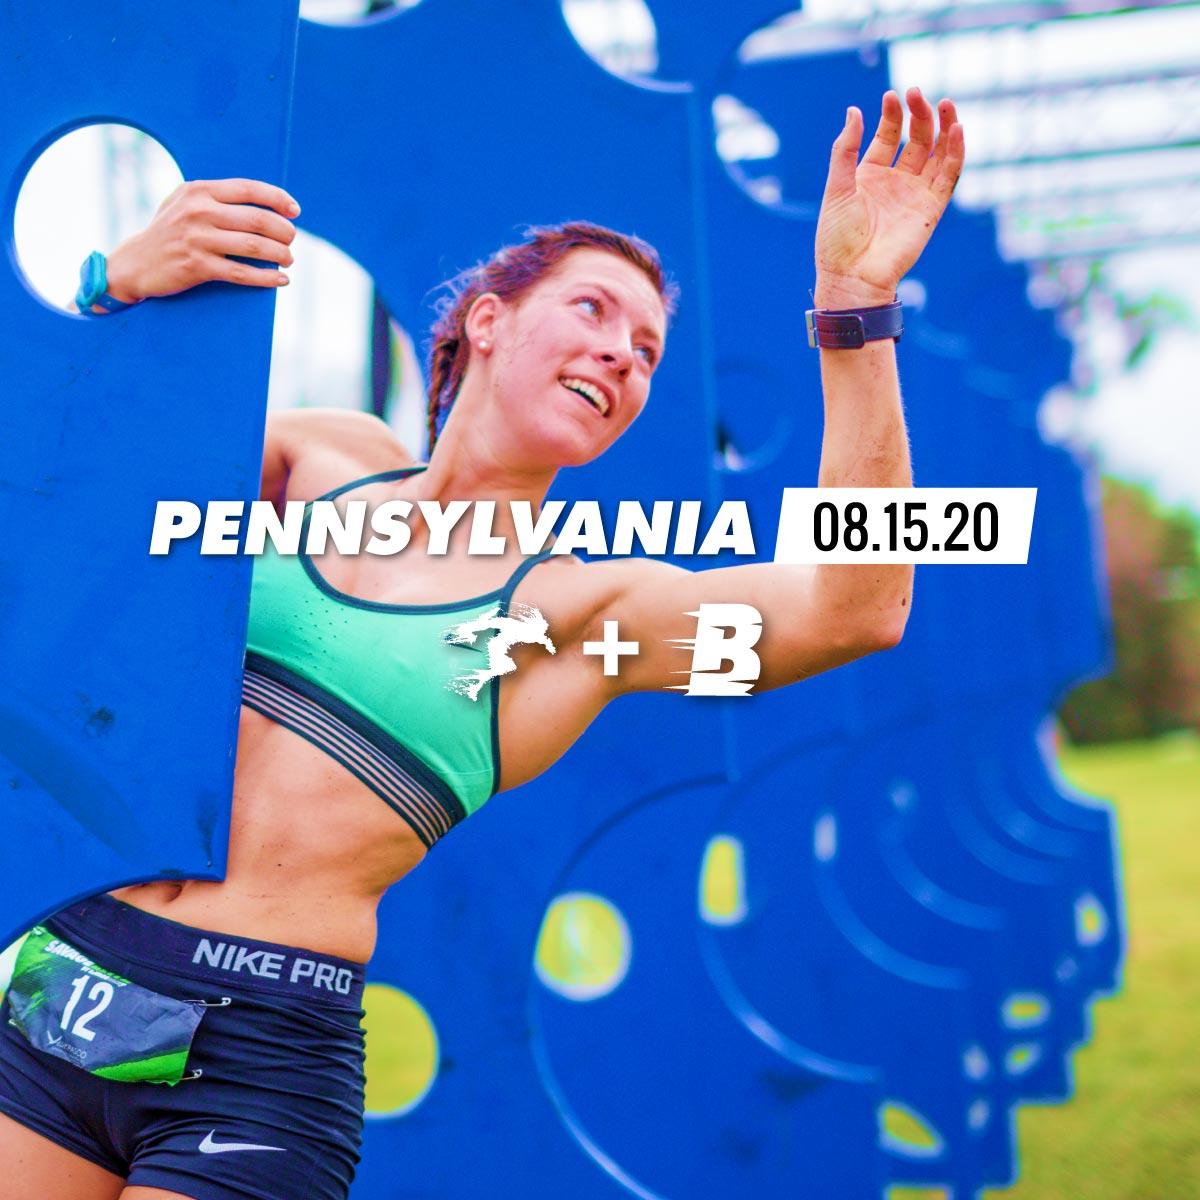 Spectator Pass - Savage Race Pennsylvania 2020